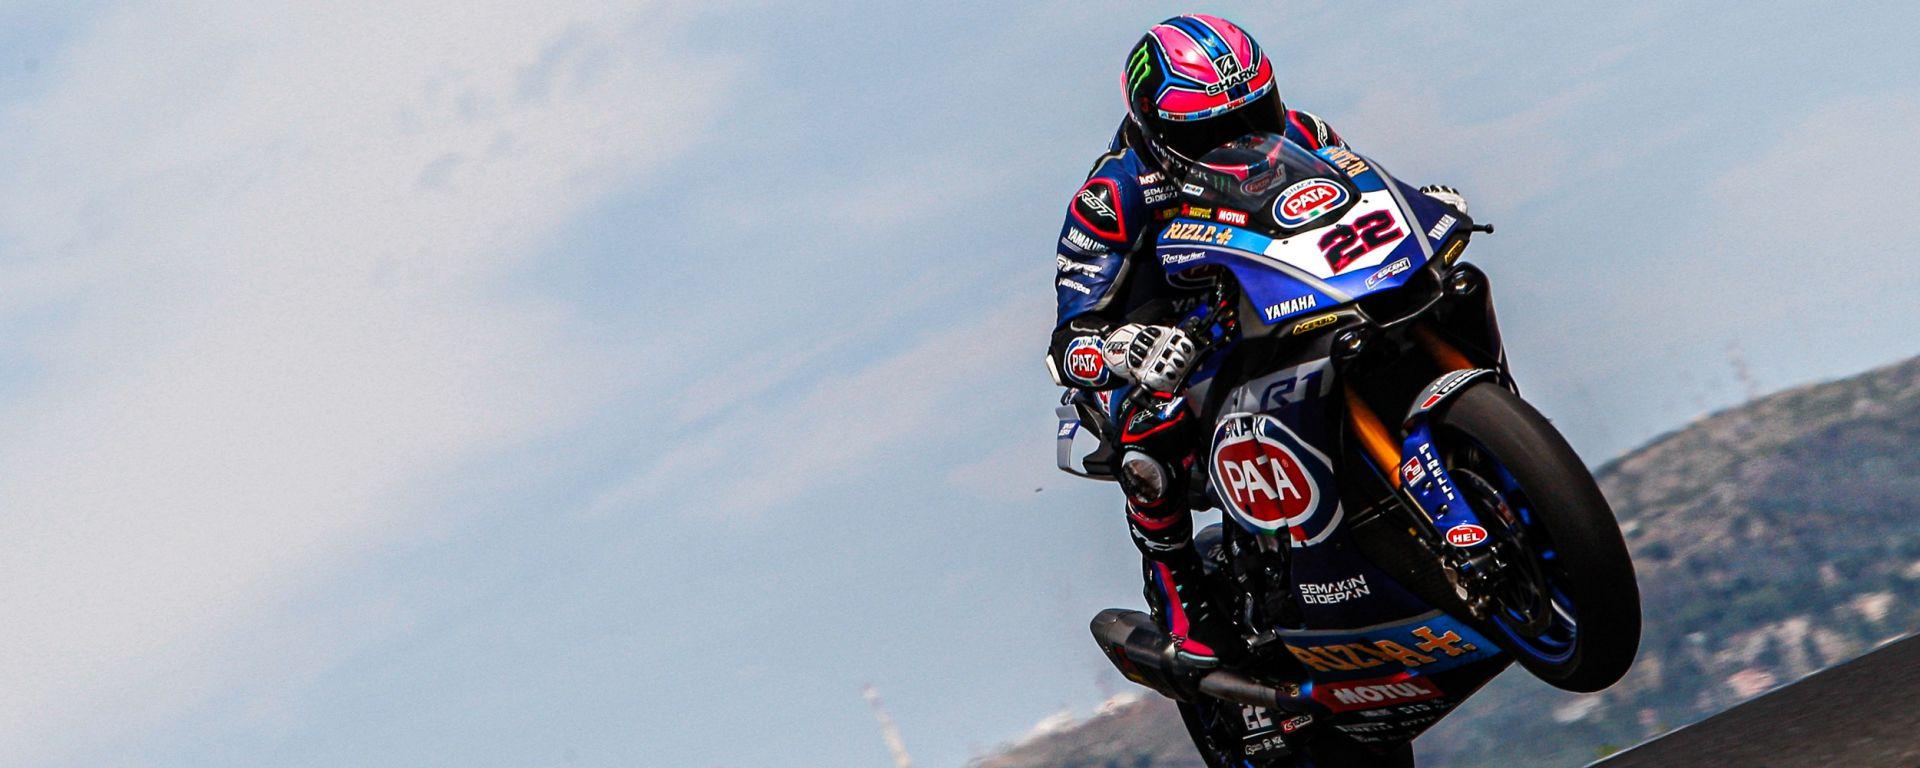 World Superbike 2019, Test Portimao, Alex Lowes (Yamaha)